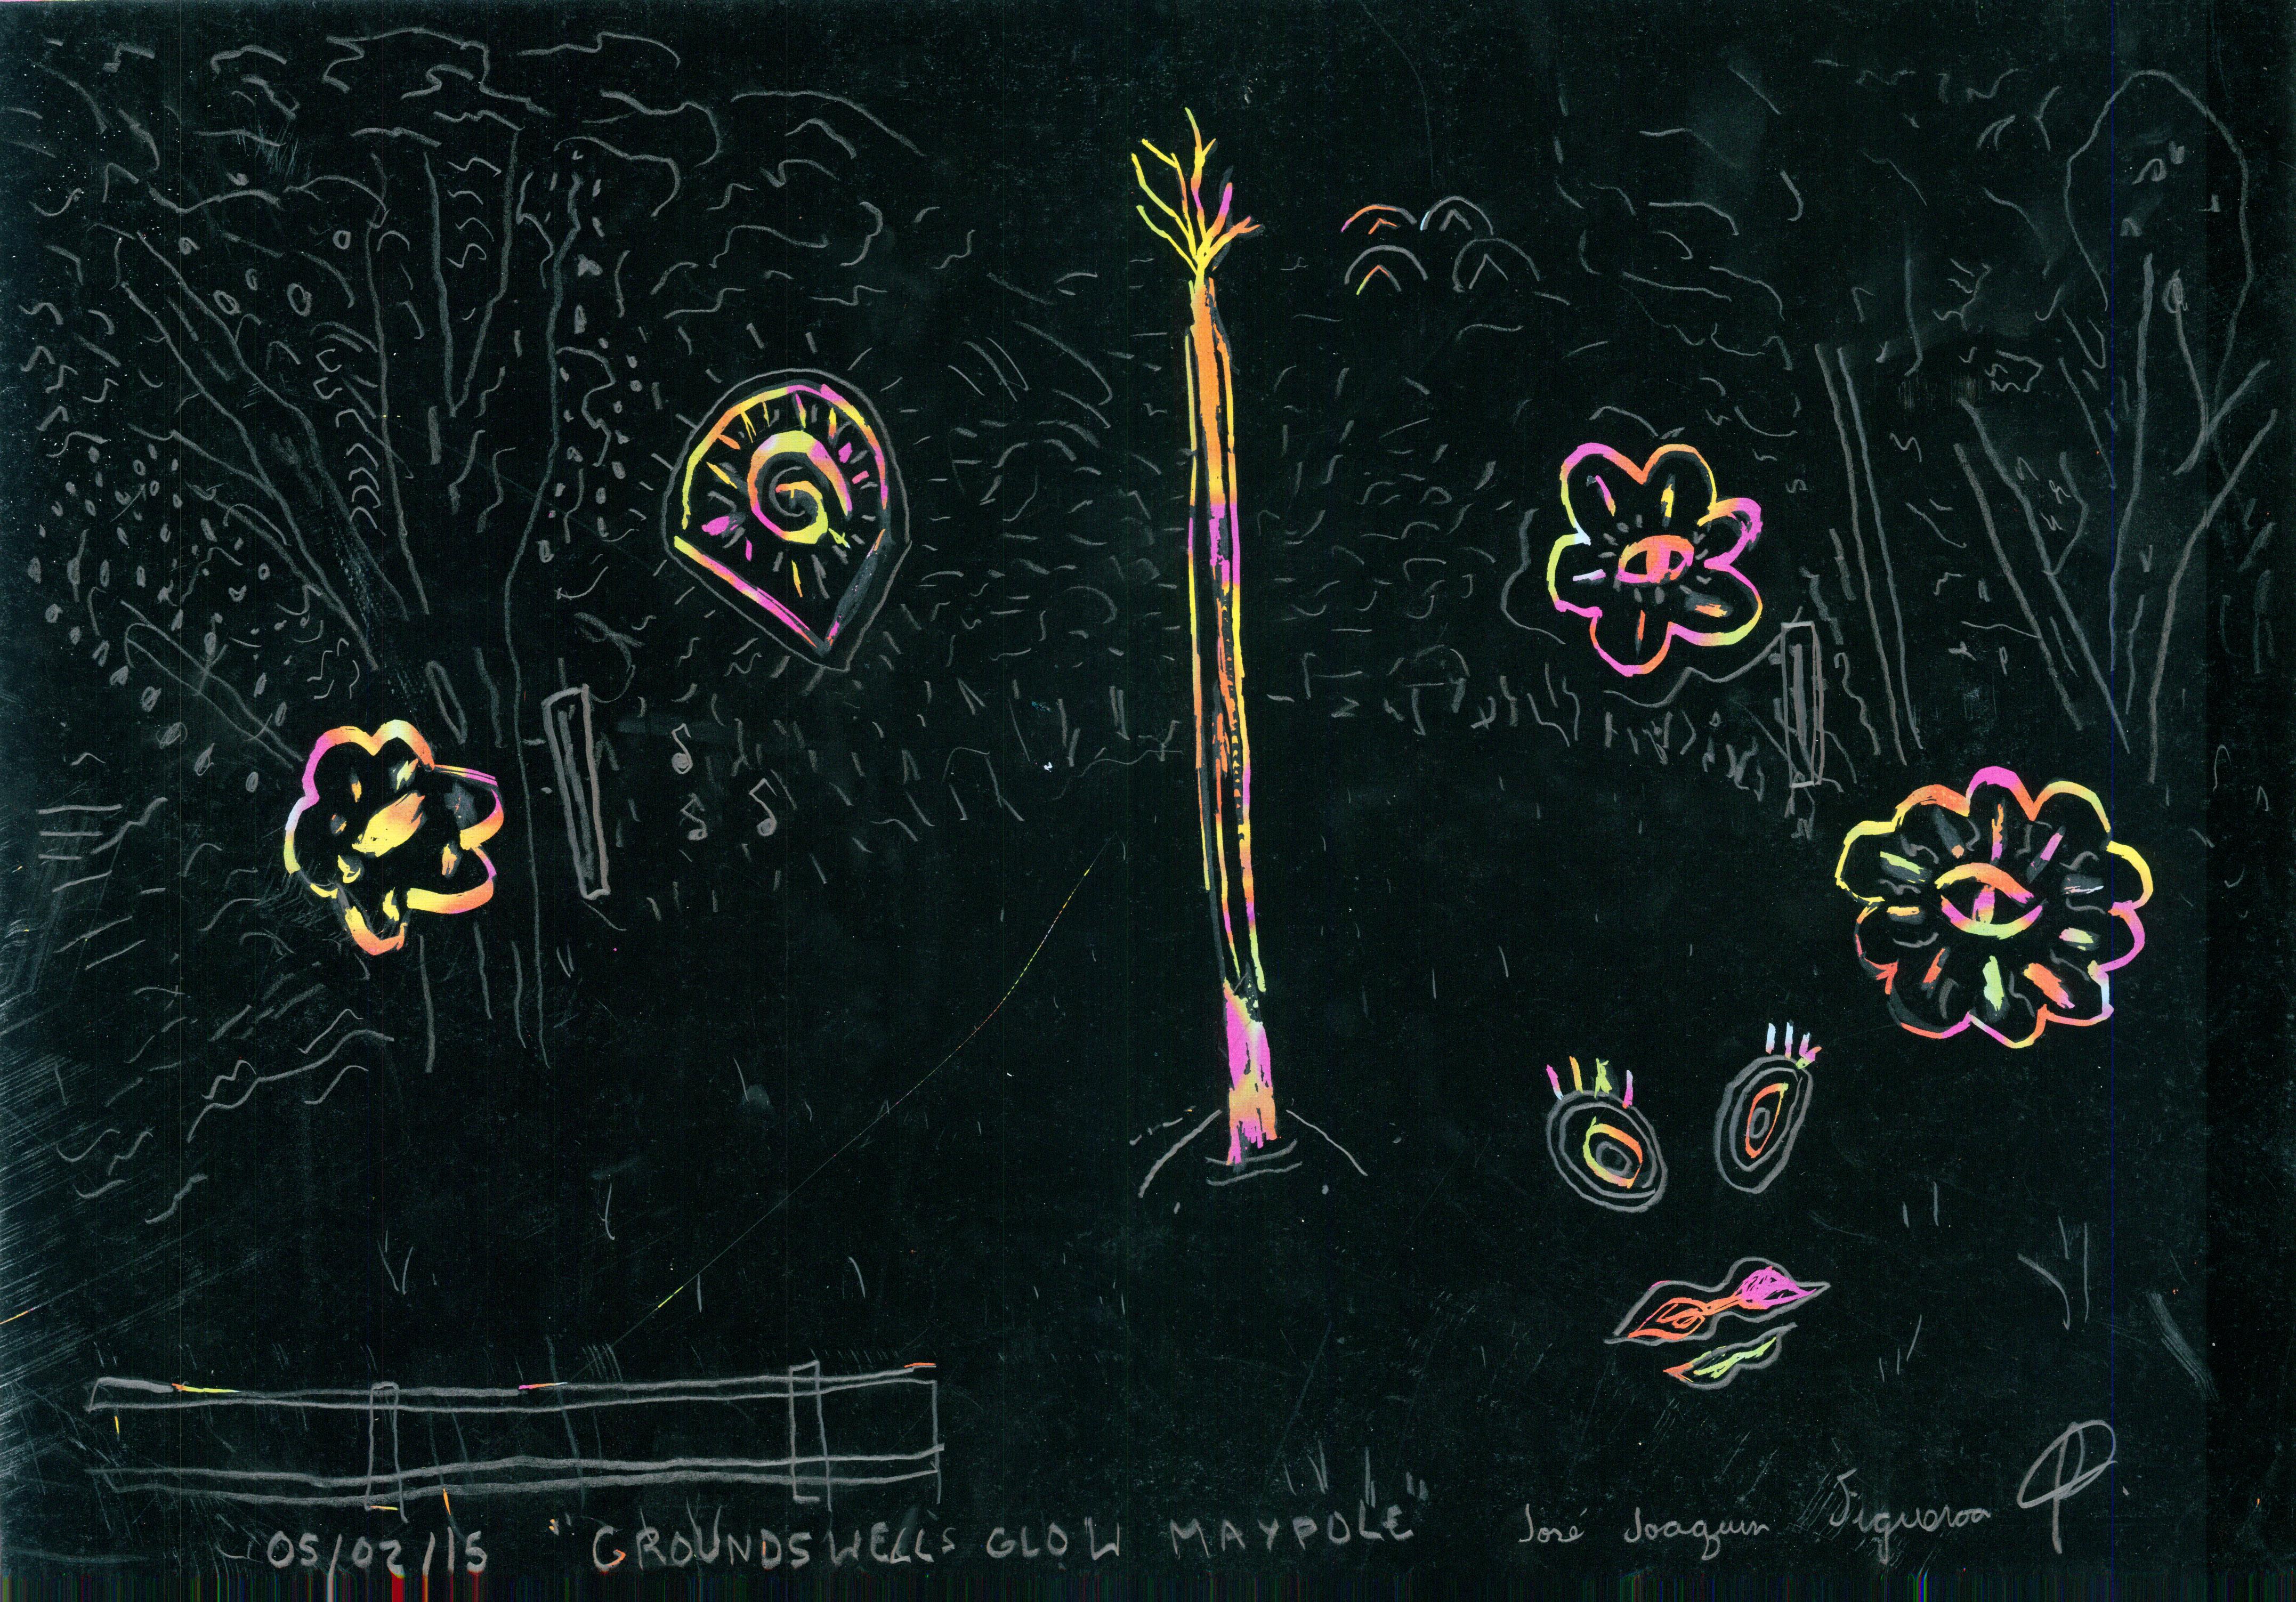 05-02-15 _Groundswells Glow Maypole_